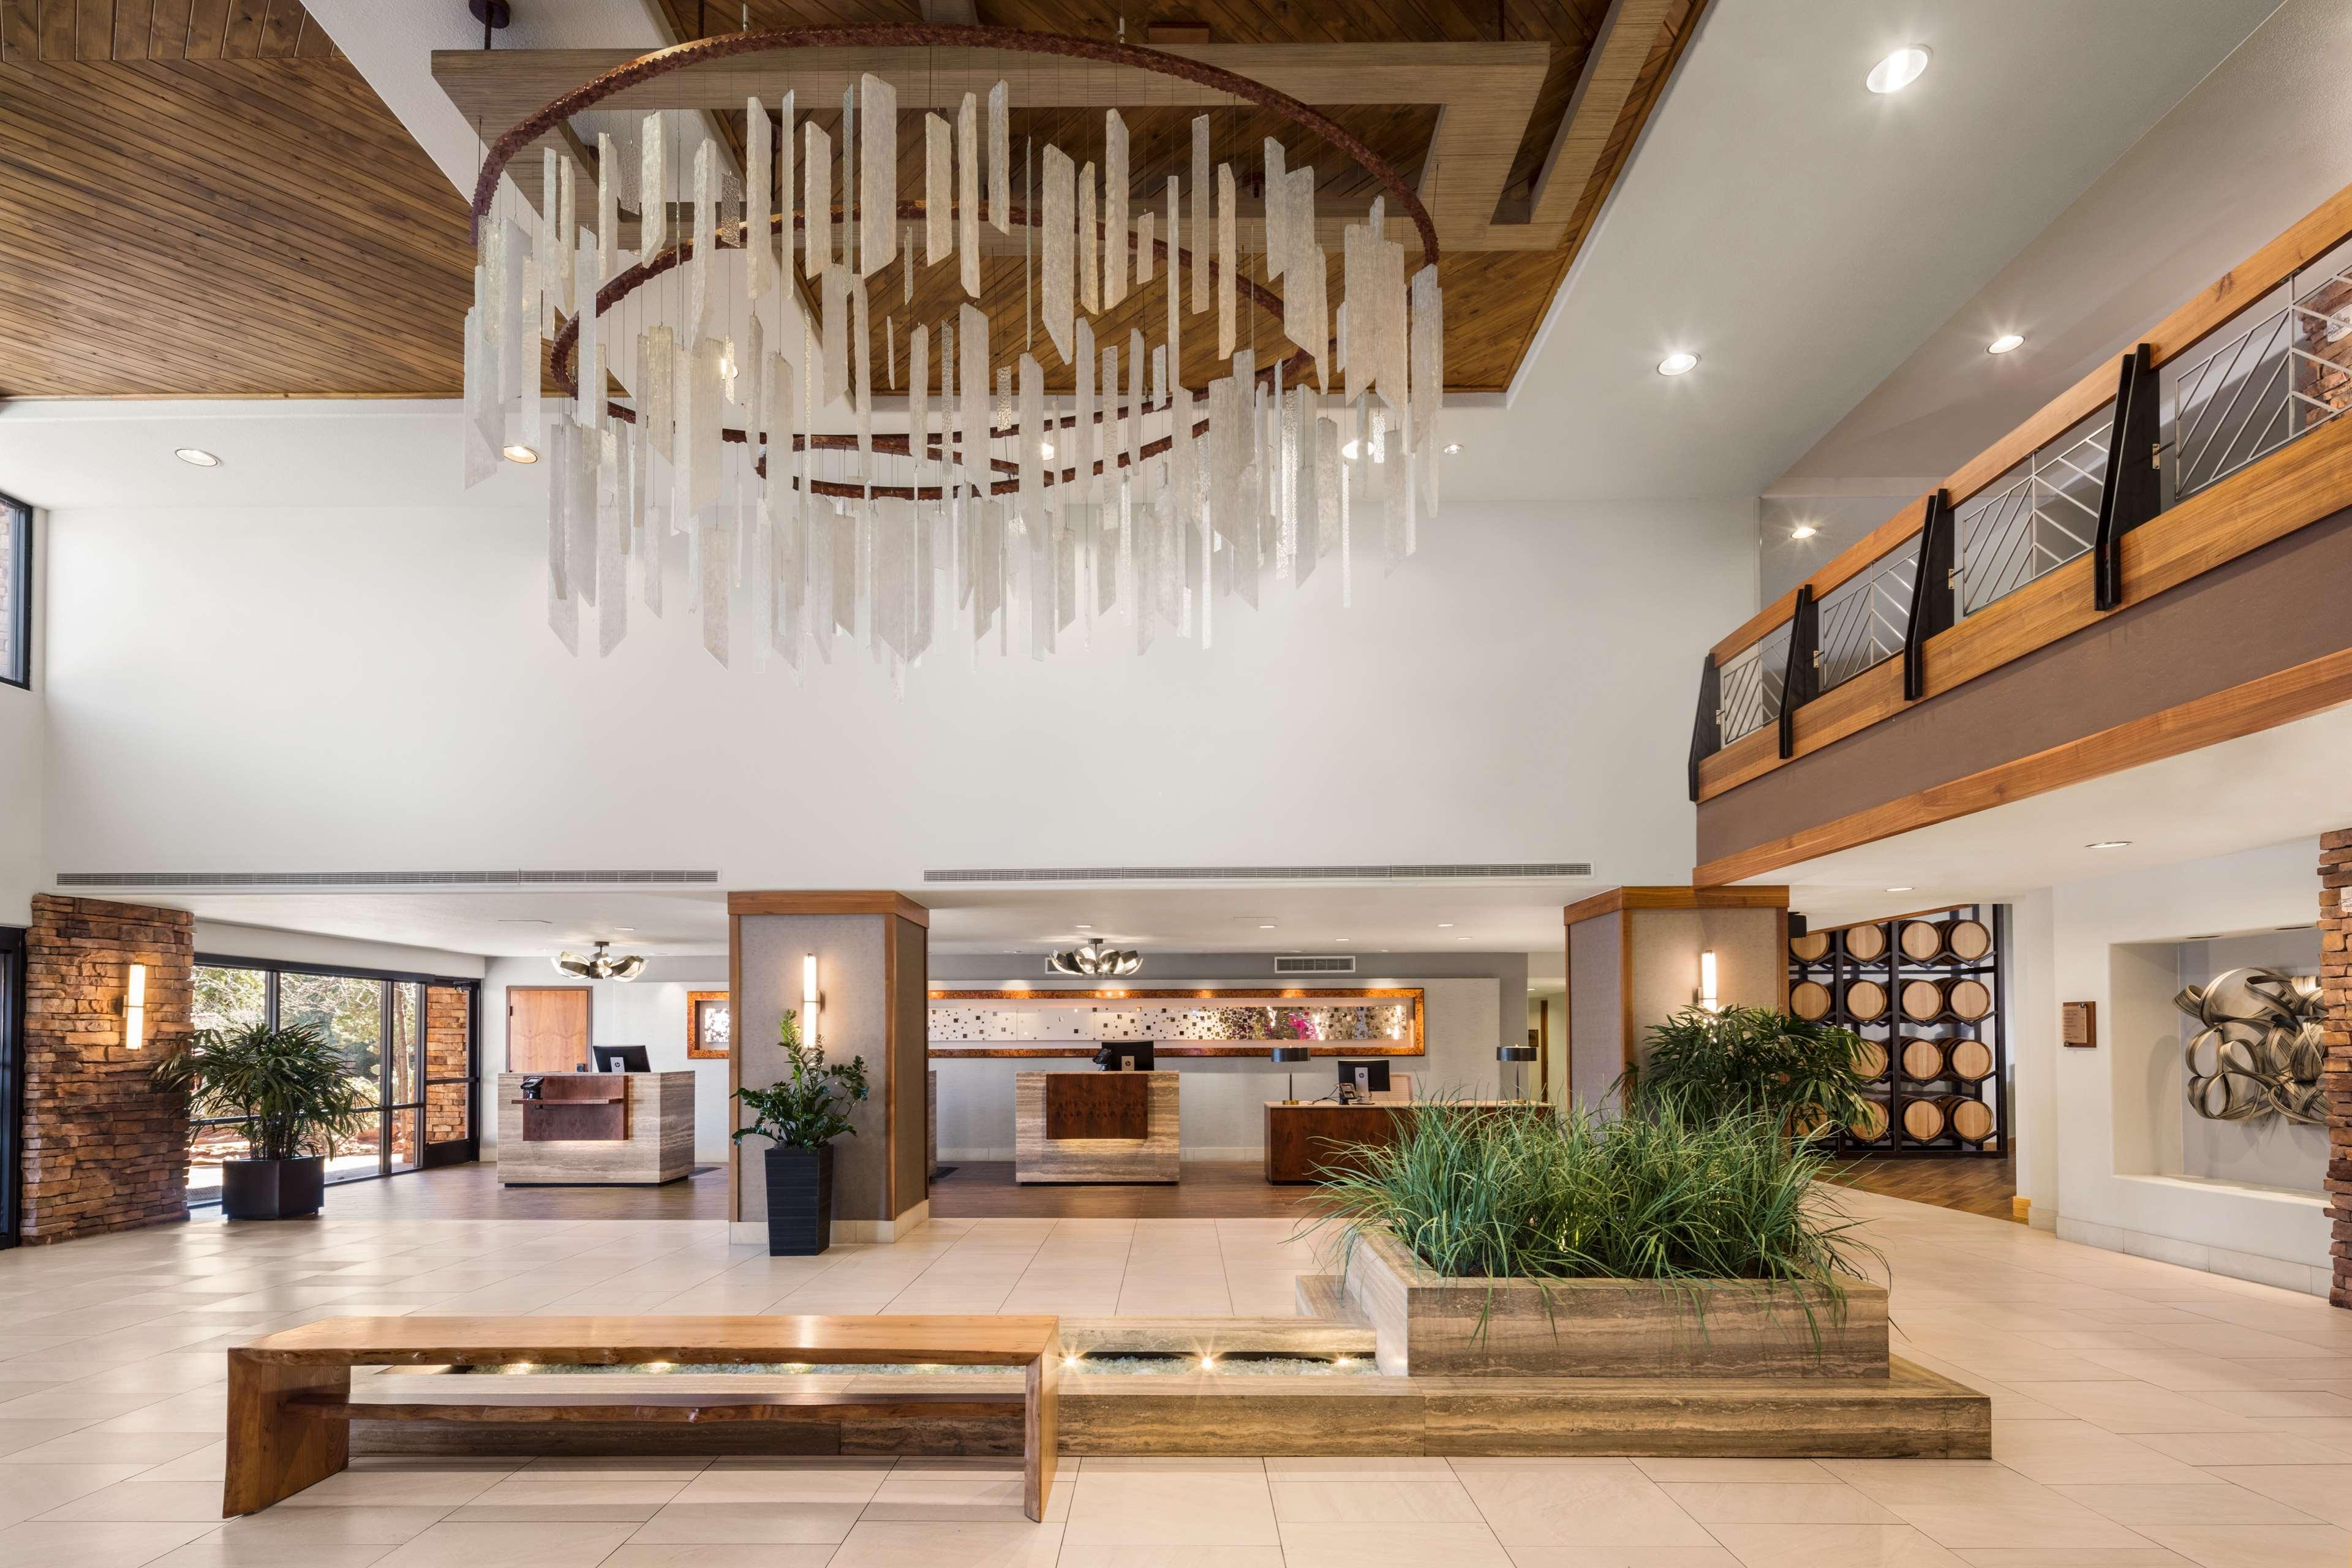 Hilton Sedona Resort at Bell Rock image 13